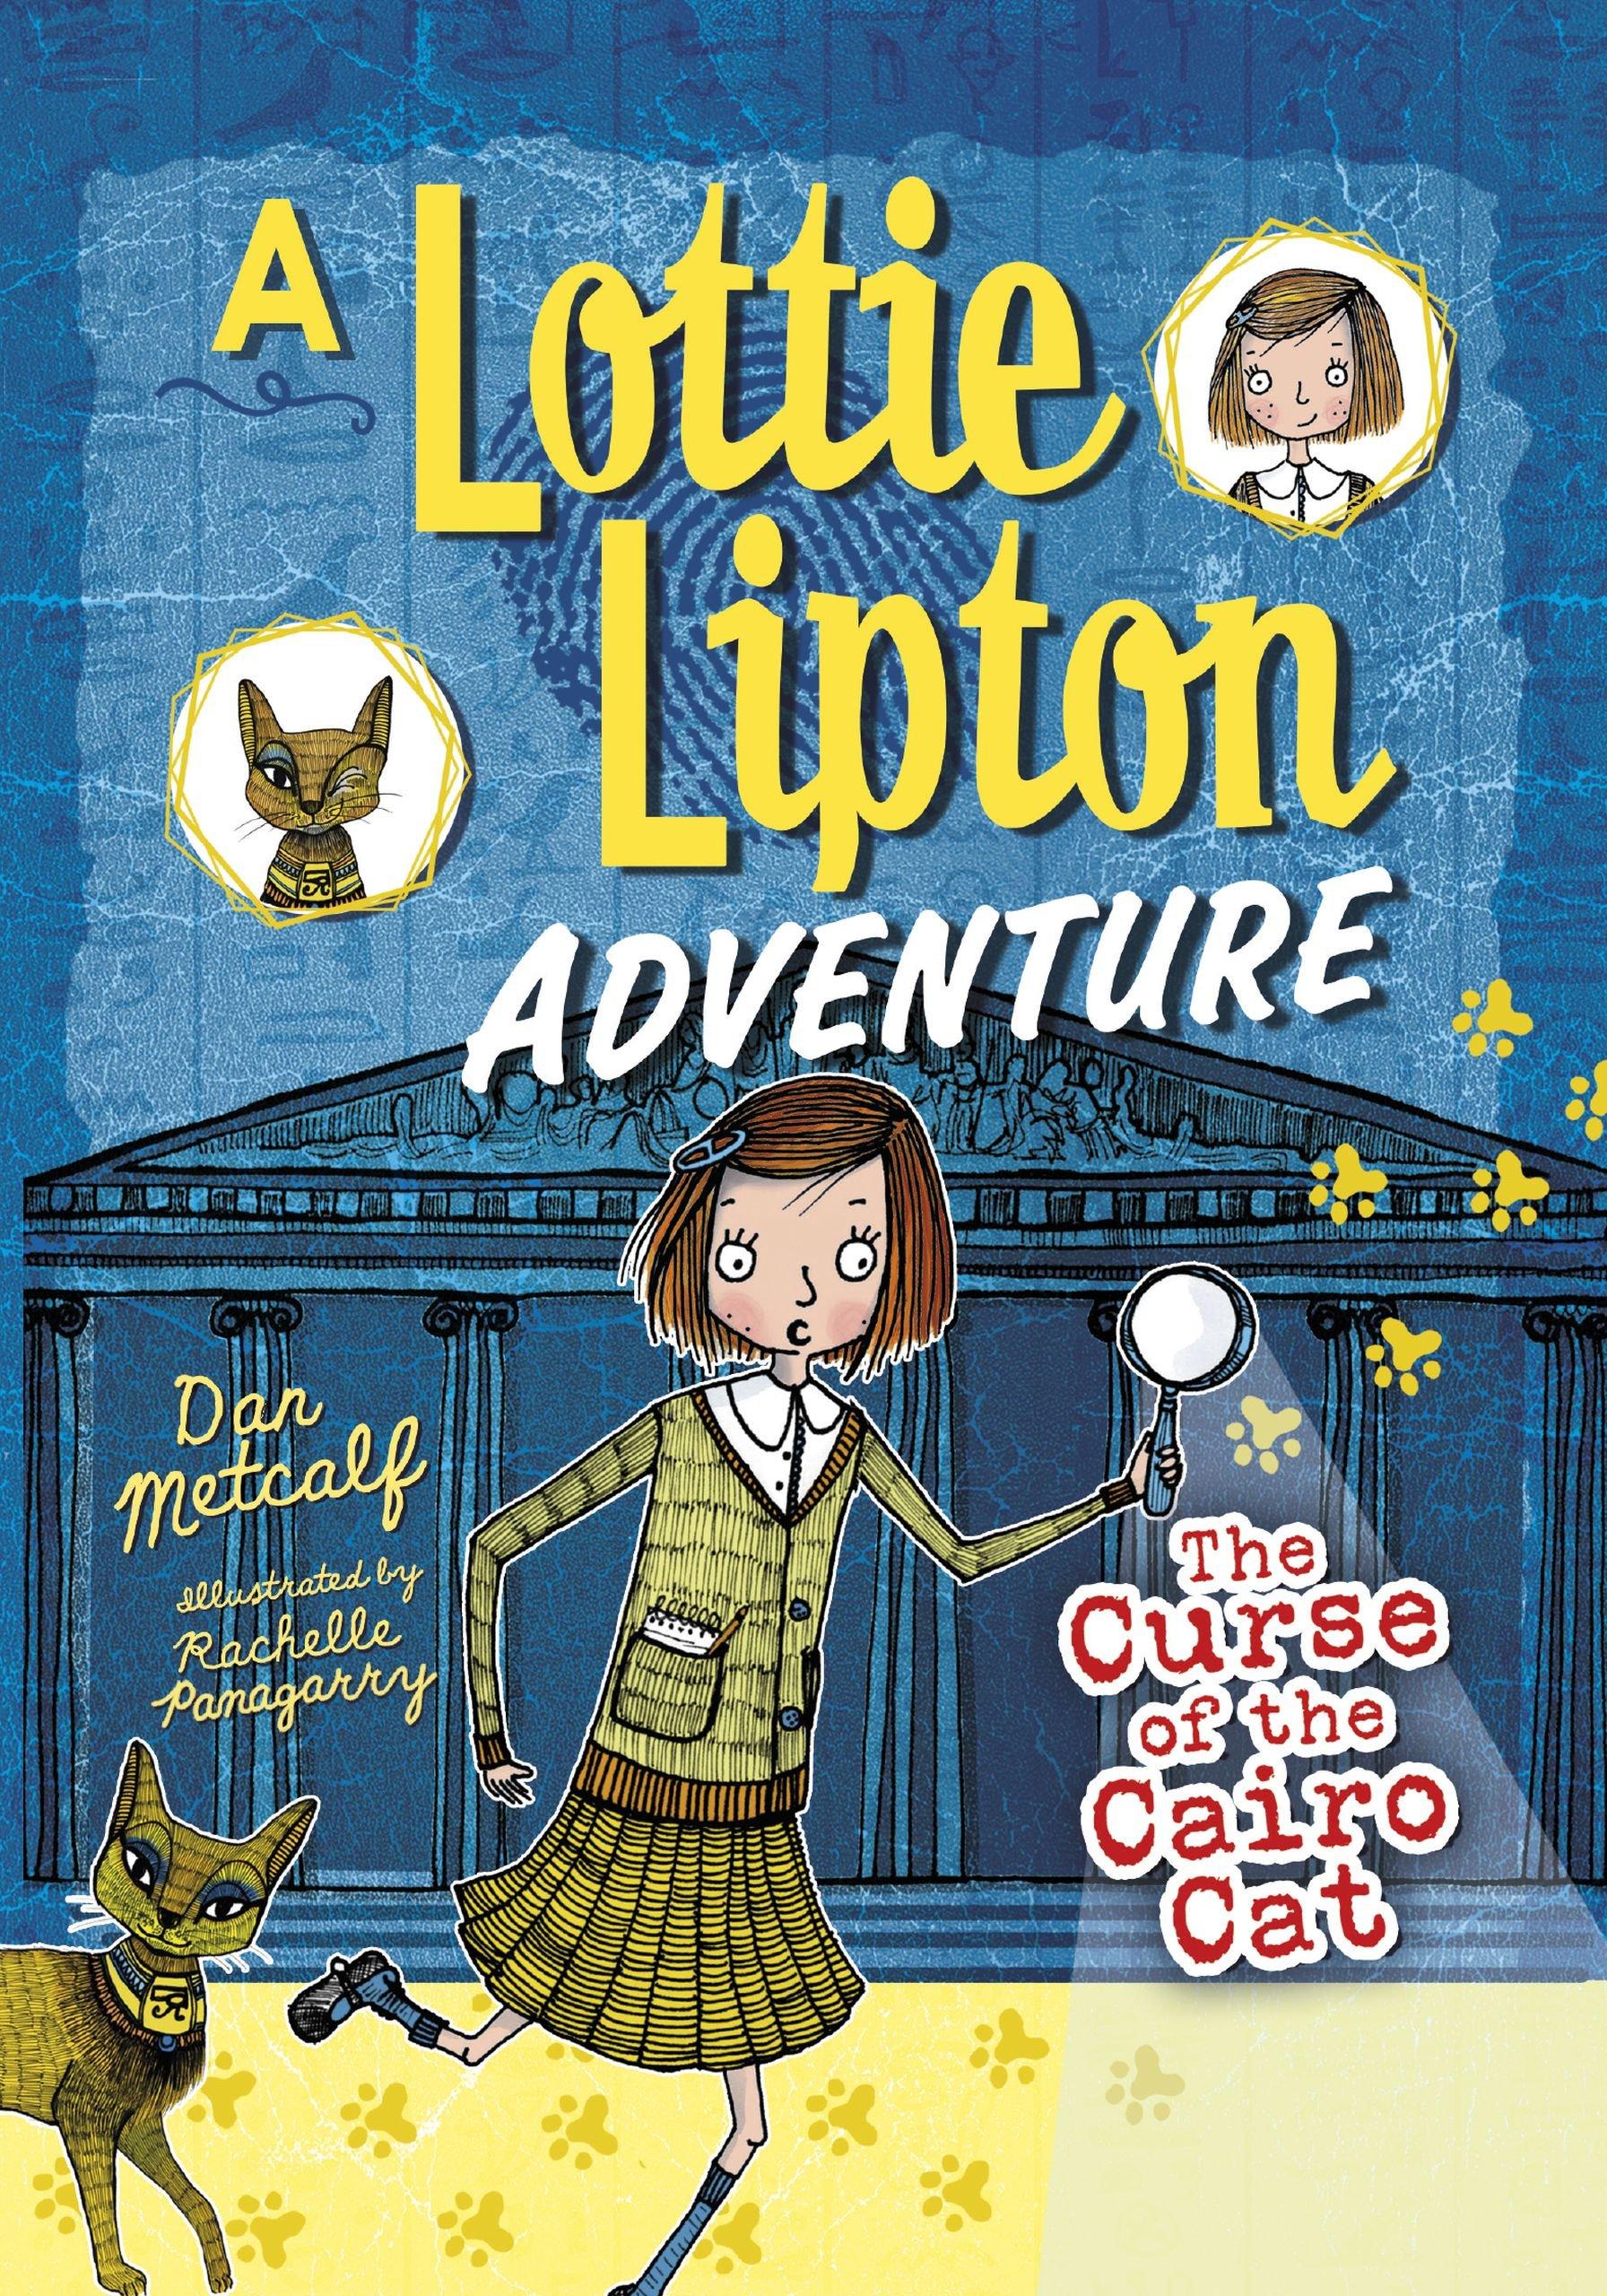 The Curse of the Cairo Cat: A Lottie Lipton Adventure (Adventures of Lottie Lipton) pdf